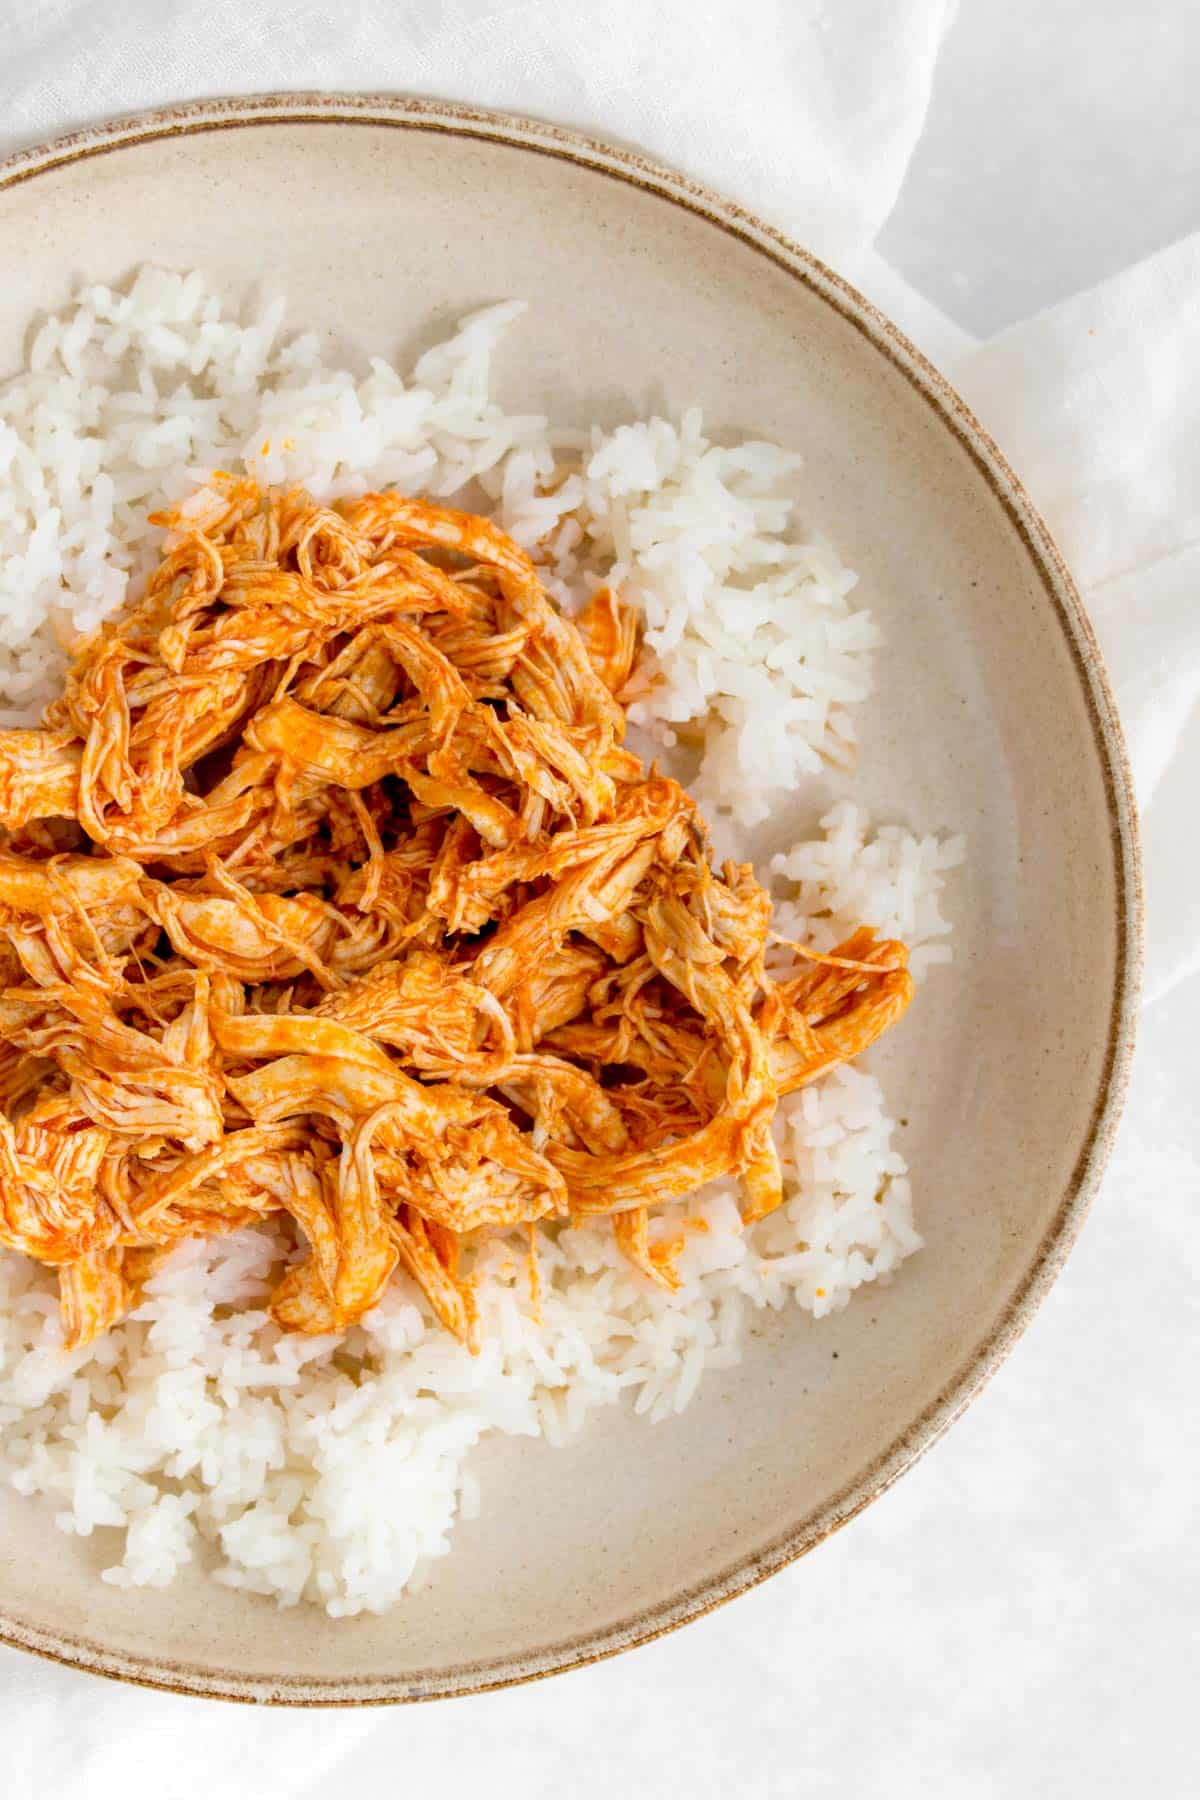 Shredded buffalo chicken over rice.